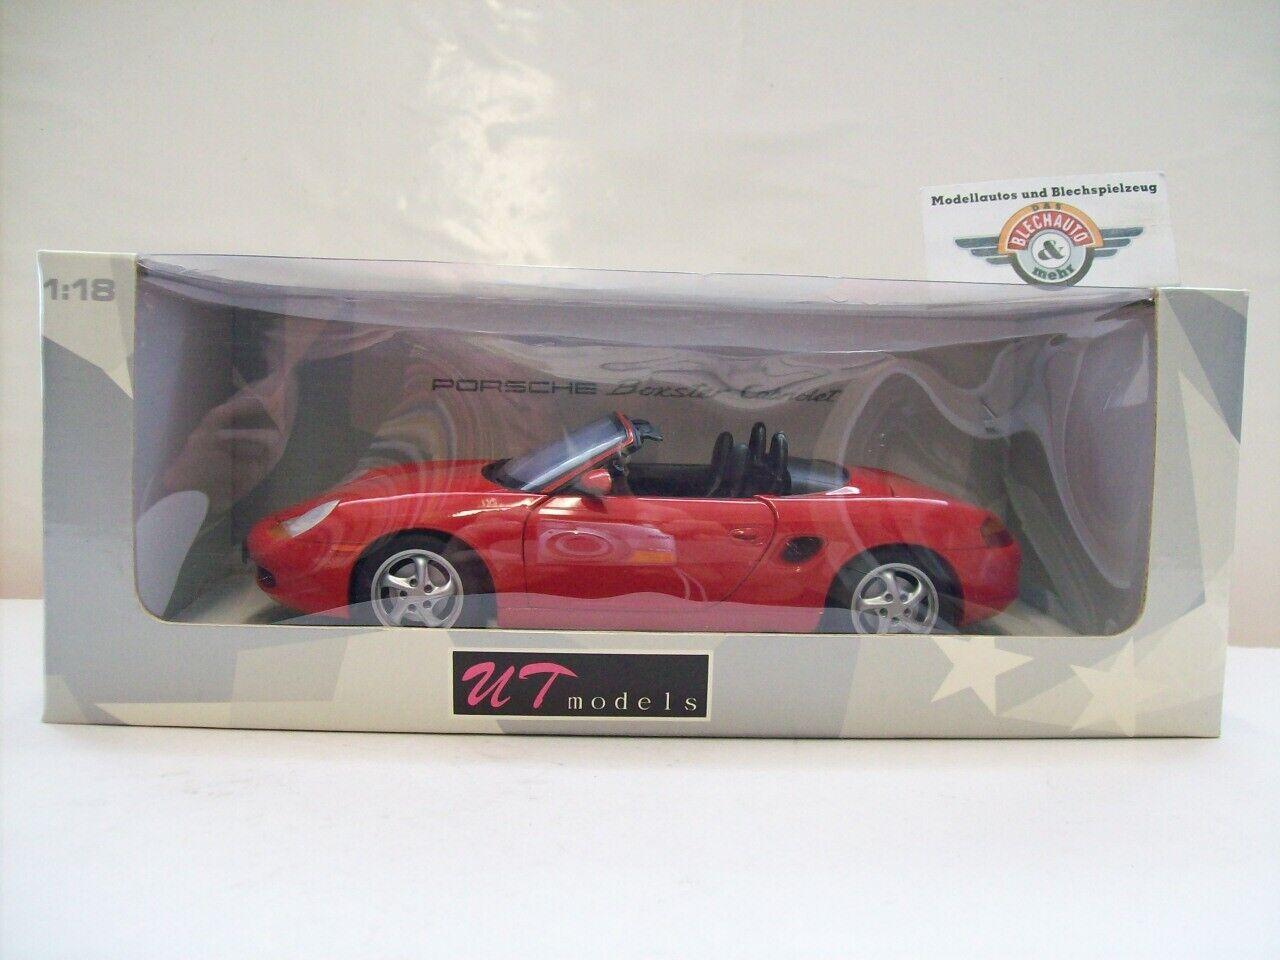 Porsche Boxster (986) Roadster, 1996, rot, UT-Models (Minichamps) 1 18, OVP